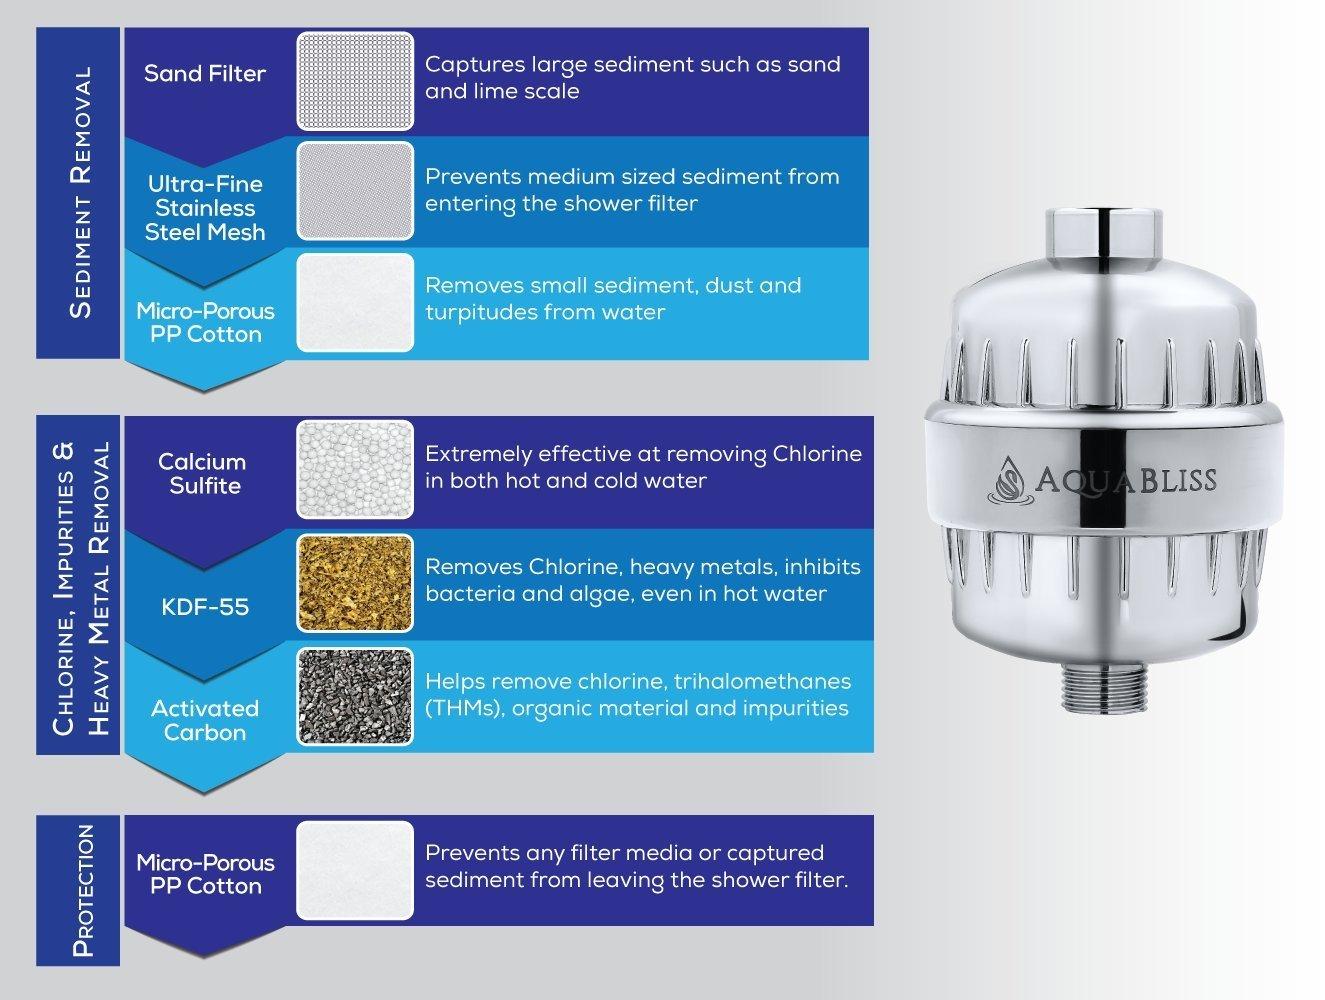 aquabliss high output universal shower filter with replaceable aquabliss high output universal shower filter with replaceable multi stage filter cartridge chrome 1 pack amazon com